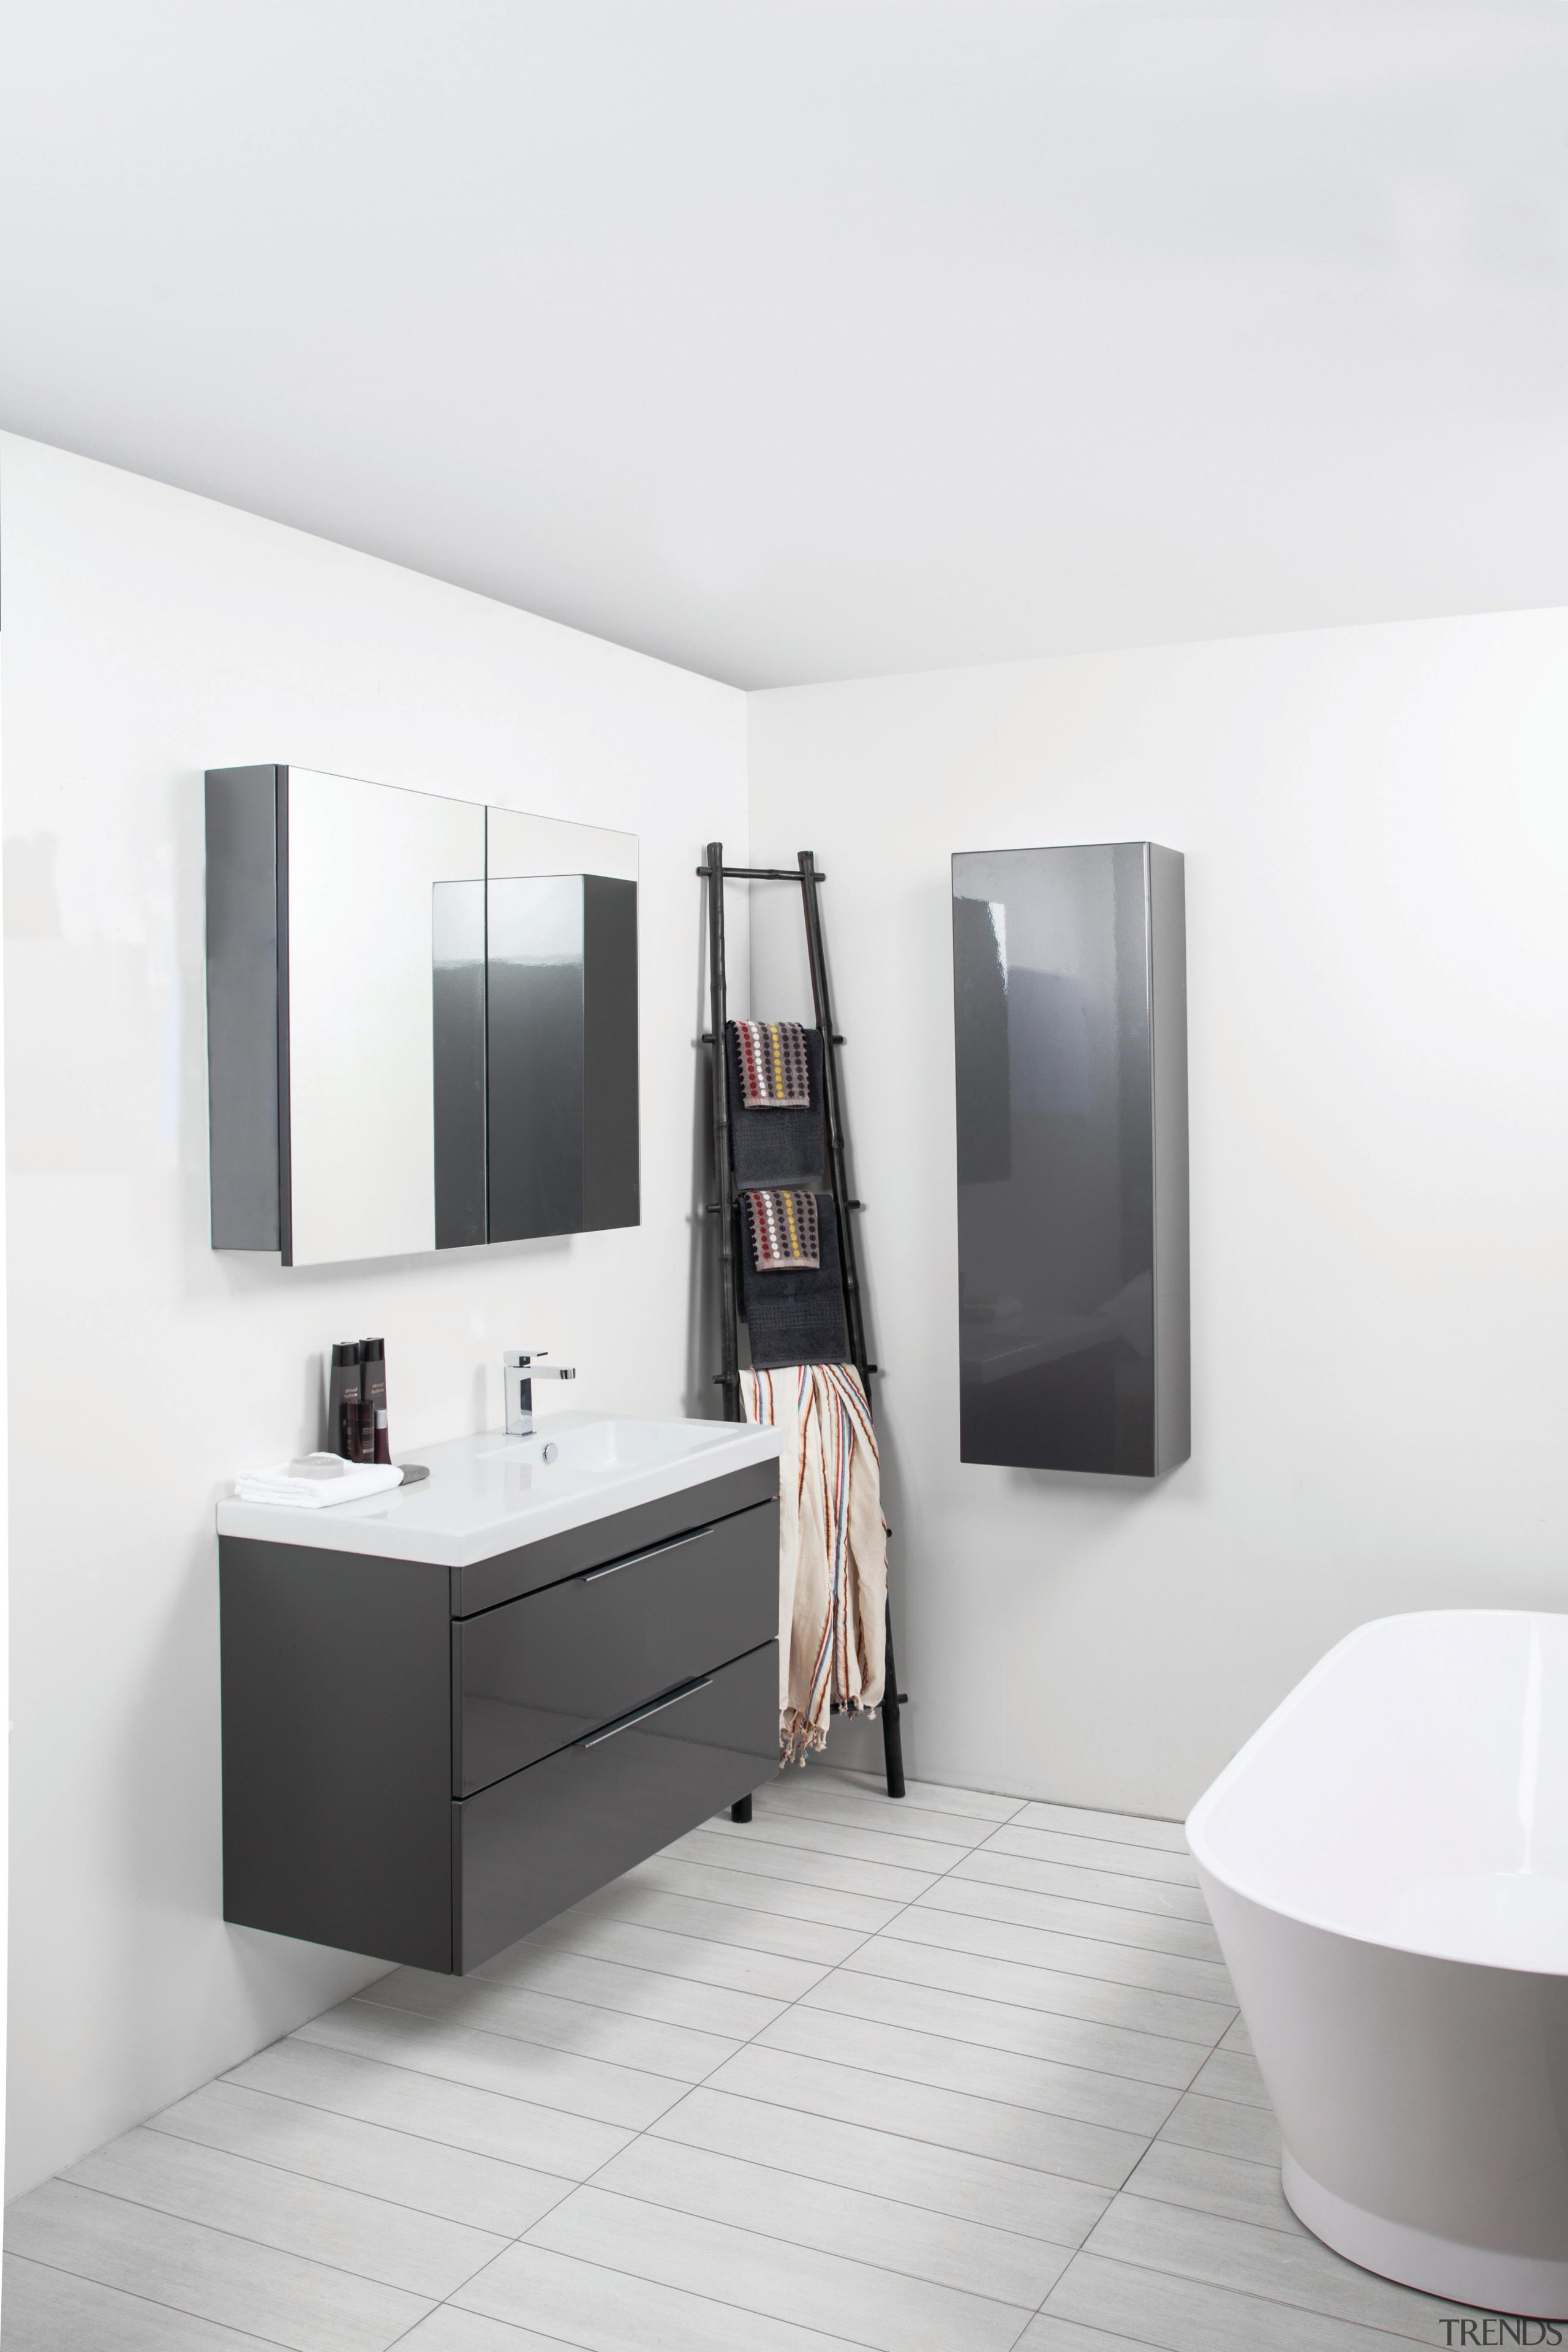 This bathroom highlights Adesso bathroomware, which combines European bathroom, bathroom accessory, bathroom cabinet, floor, interior design, plumbing fixture, product design, room, sink, tap, white